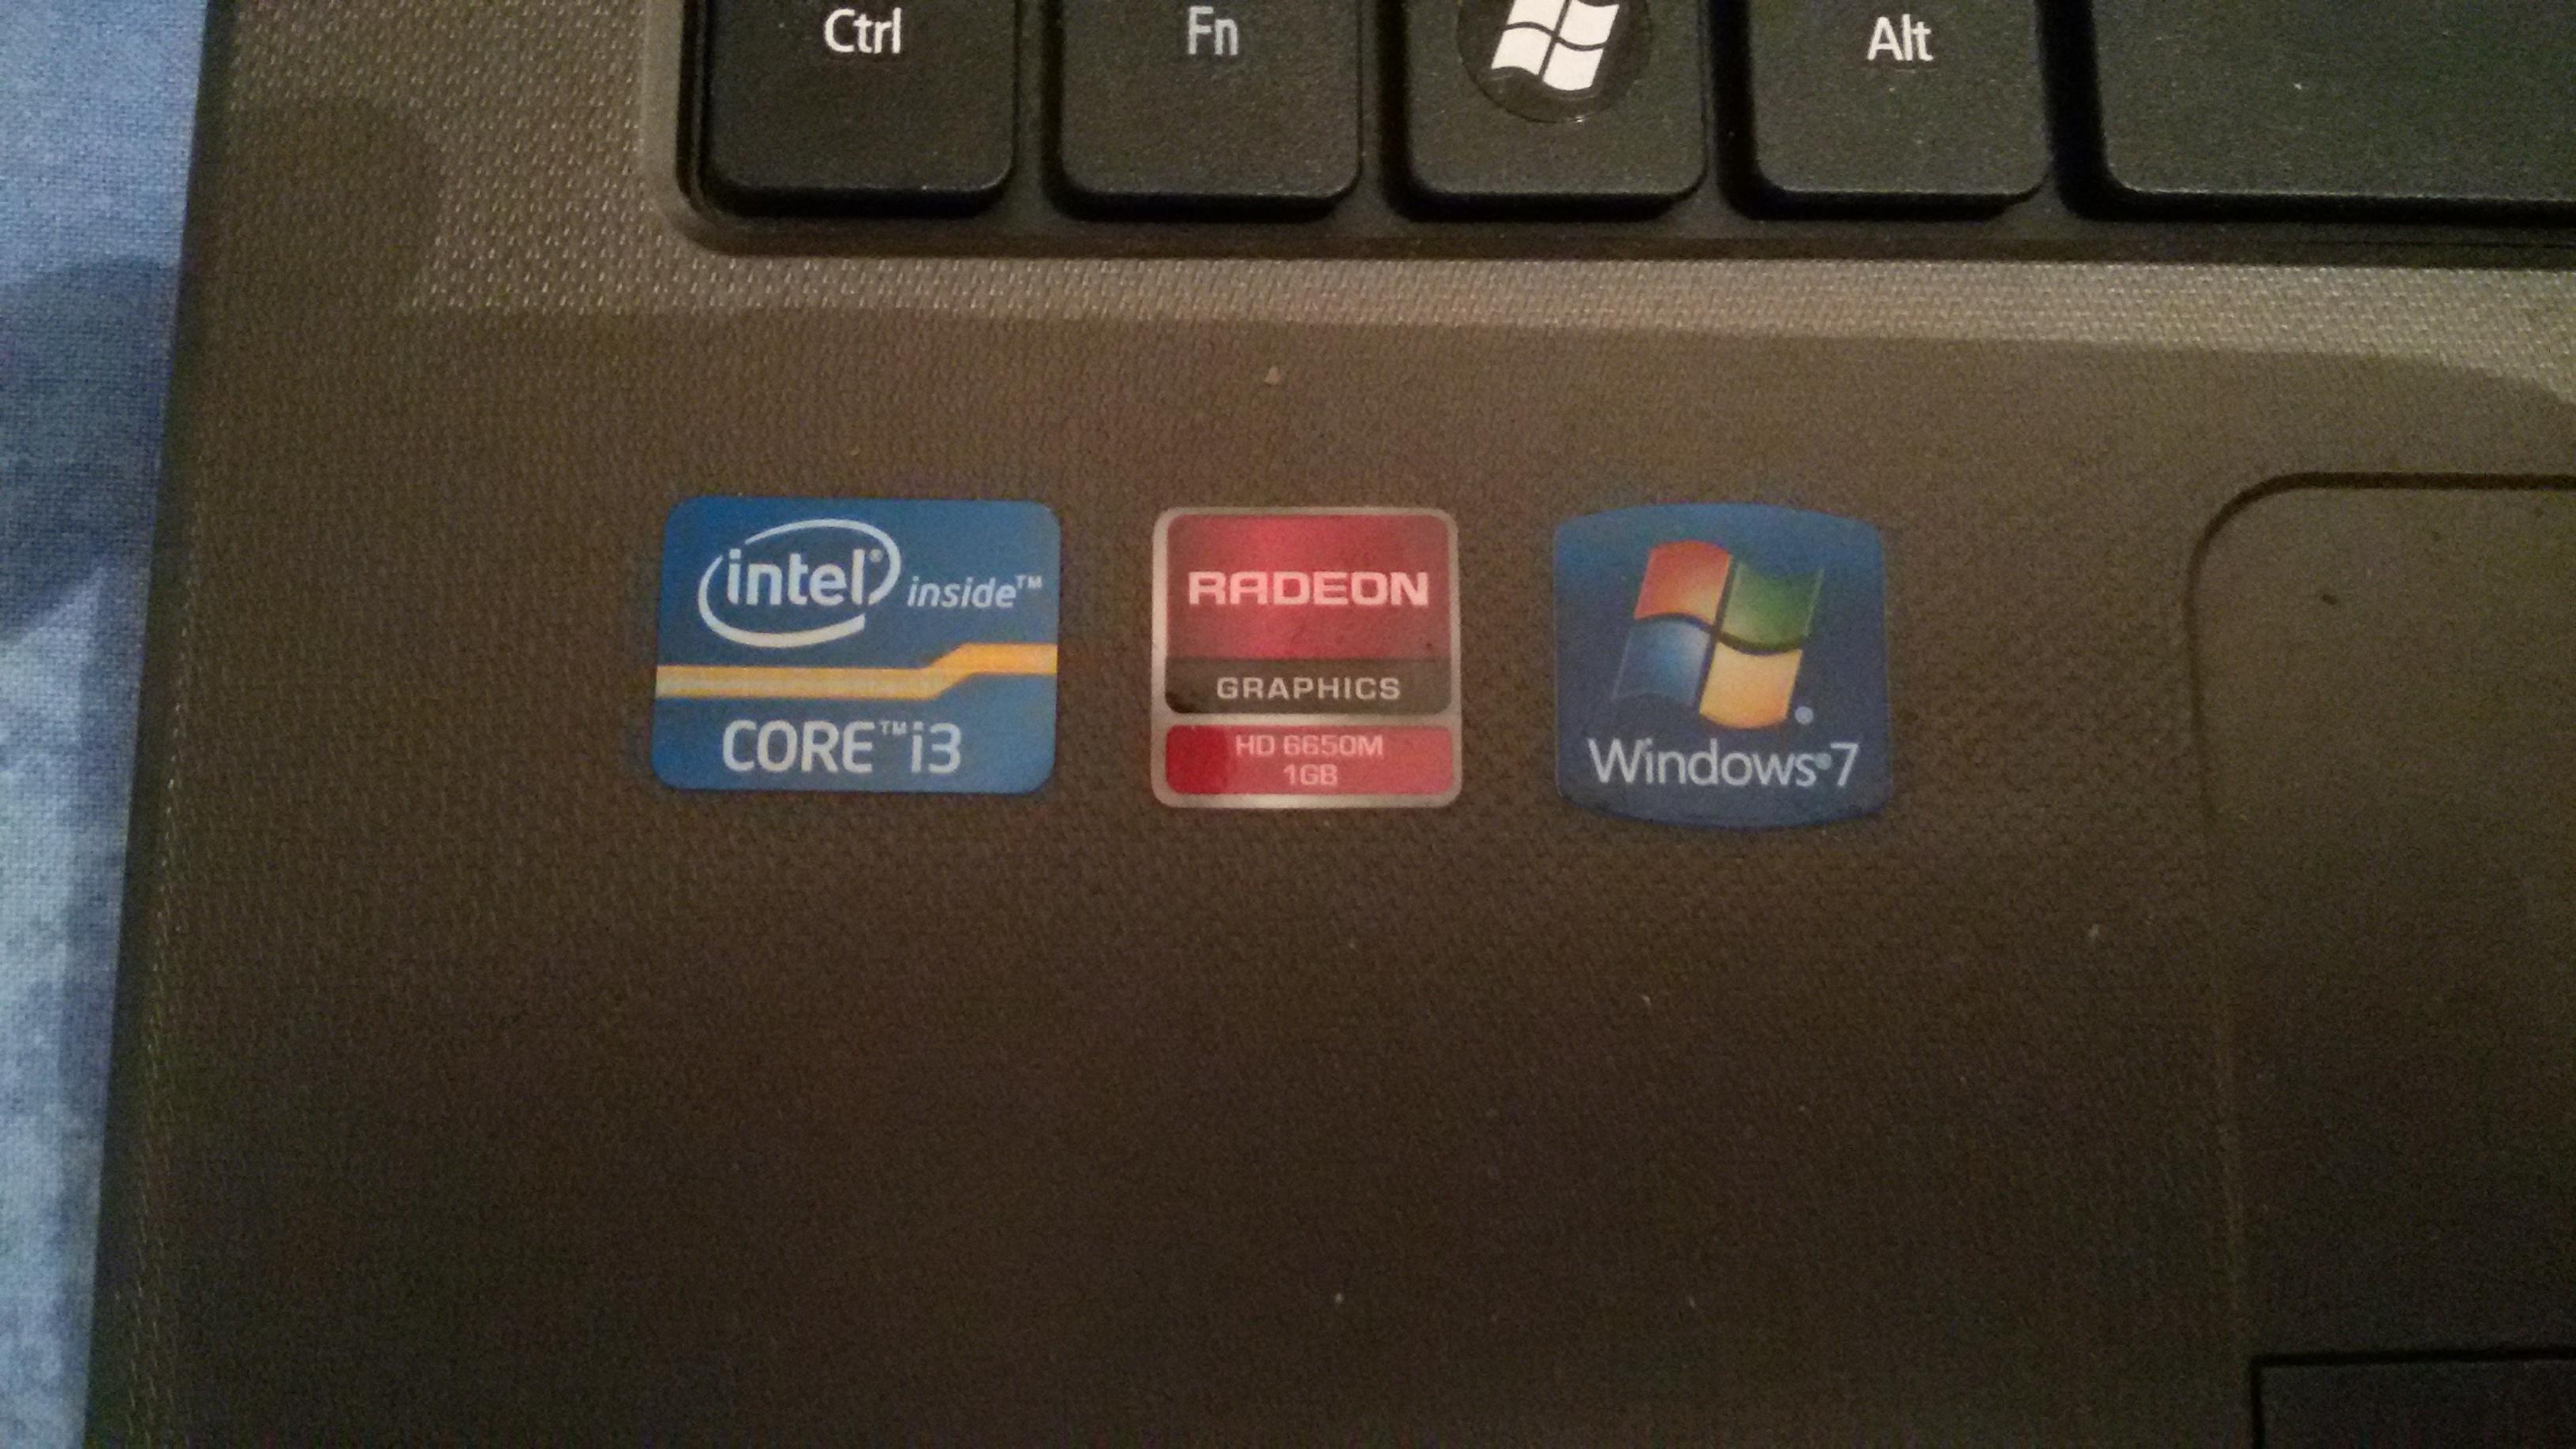 Acer Aspire 7750 G